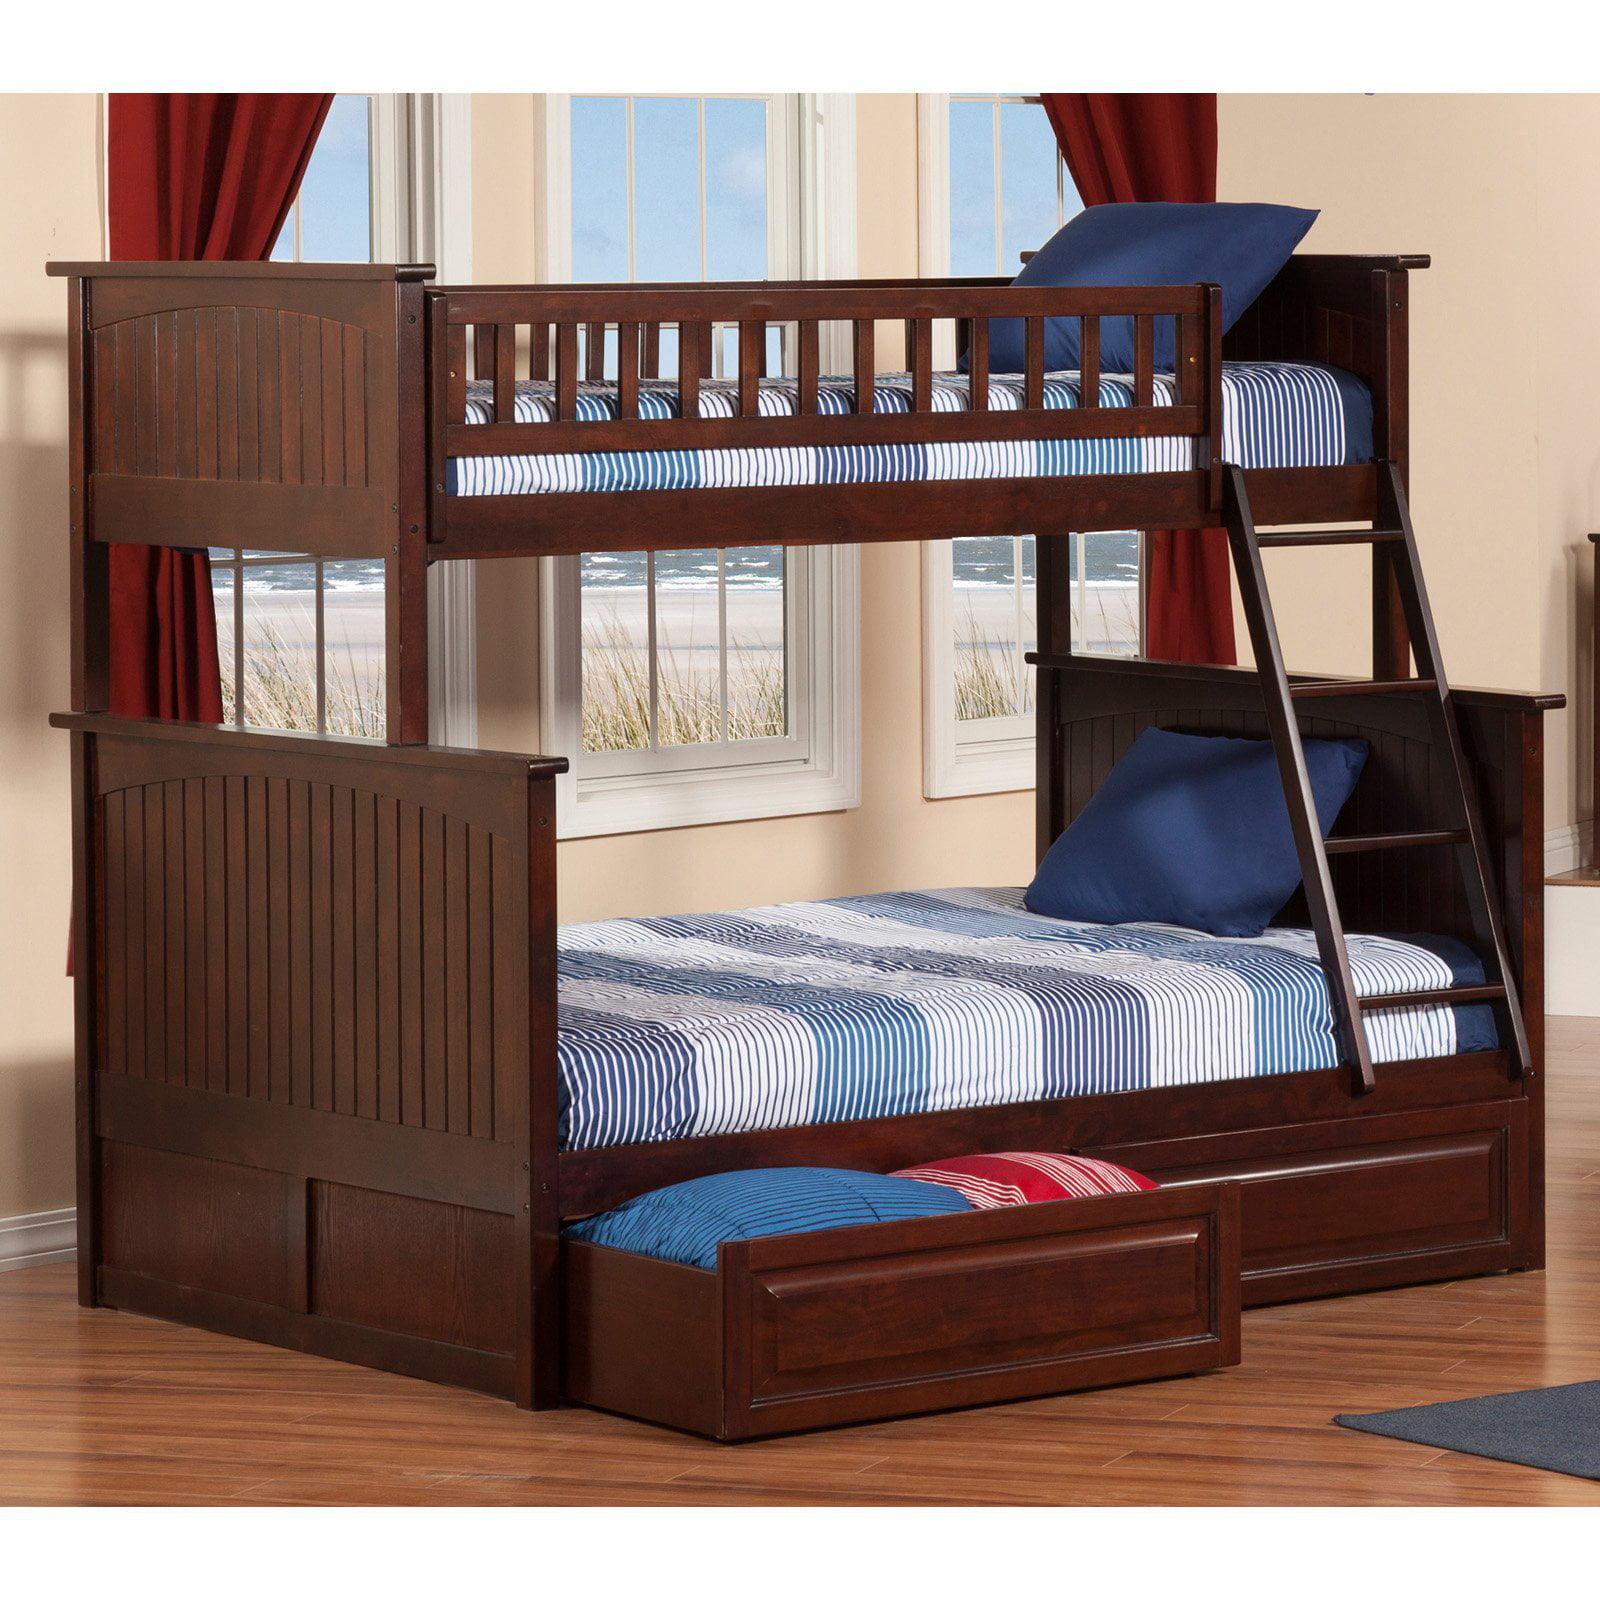 Atlantic Furniture Nantucket Twin Over Full Bunk Bed